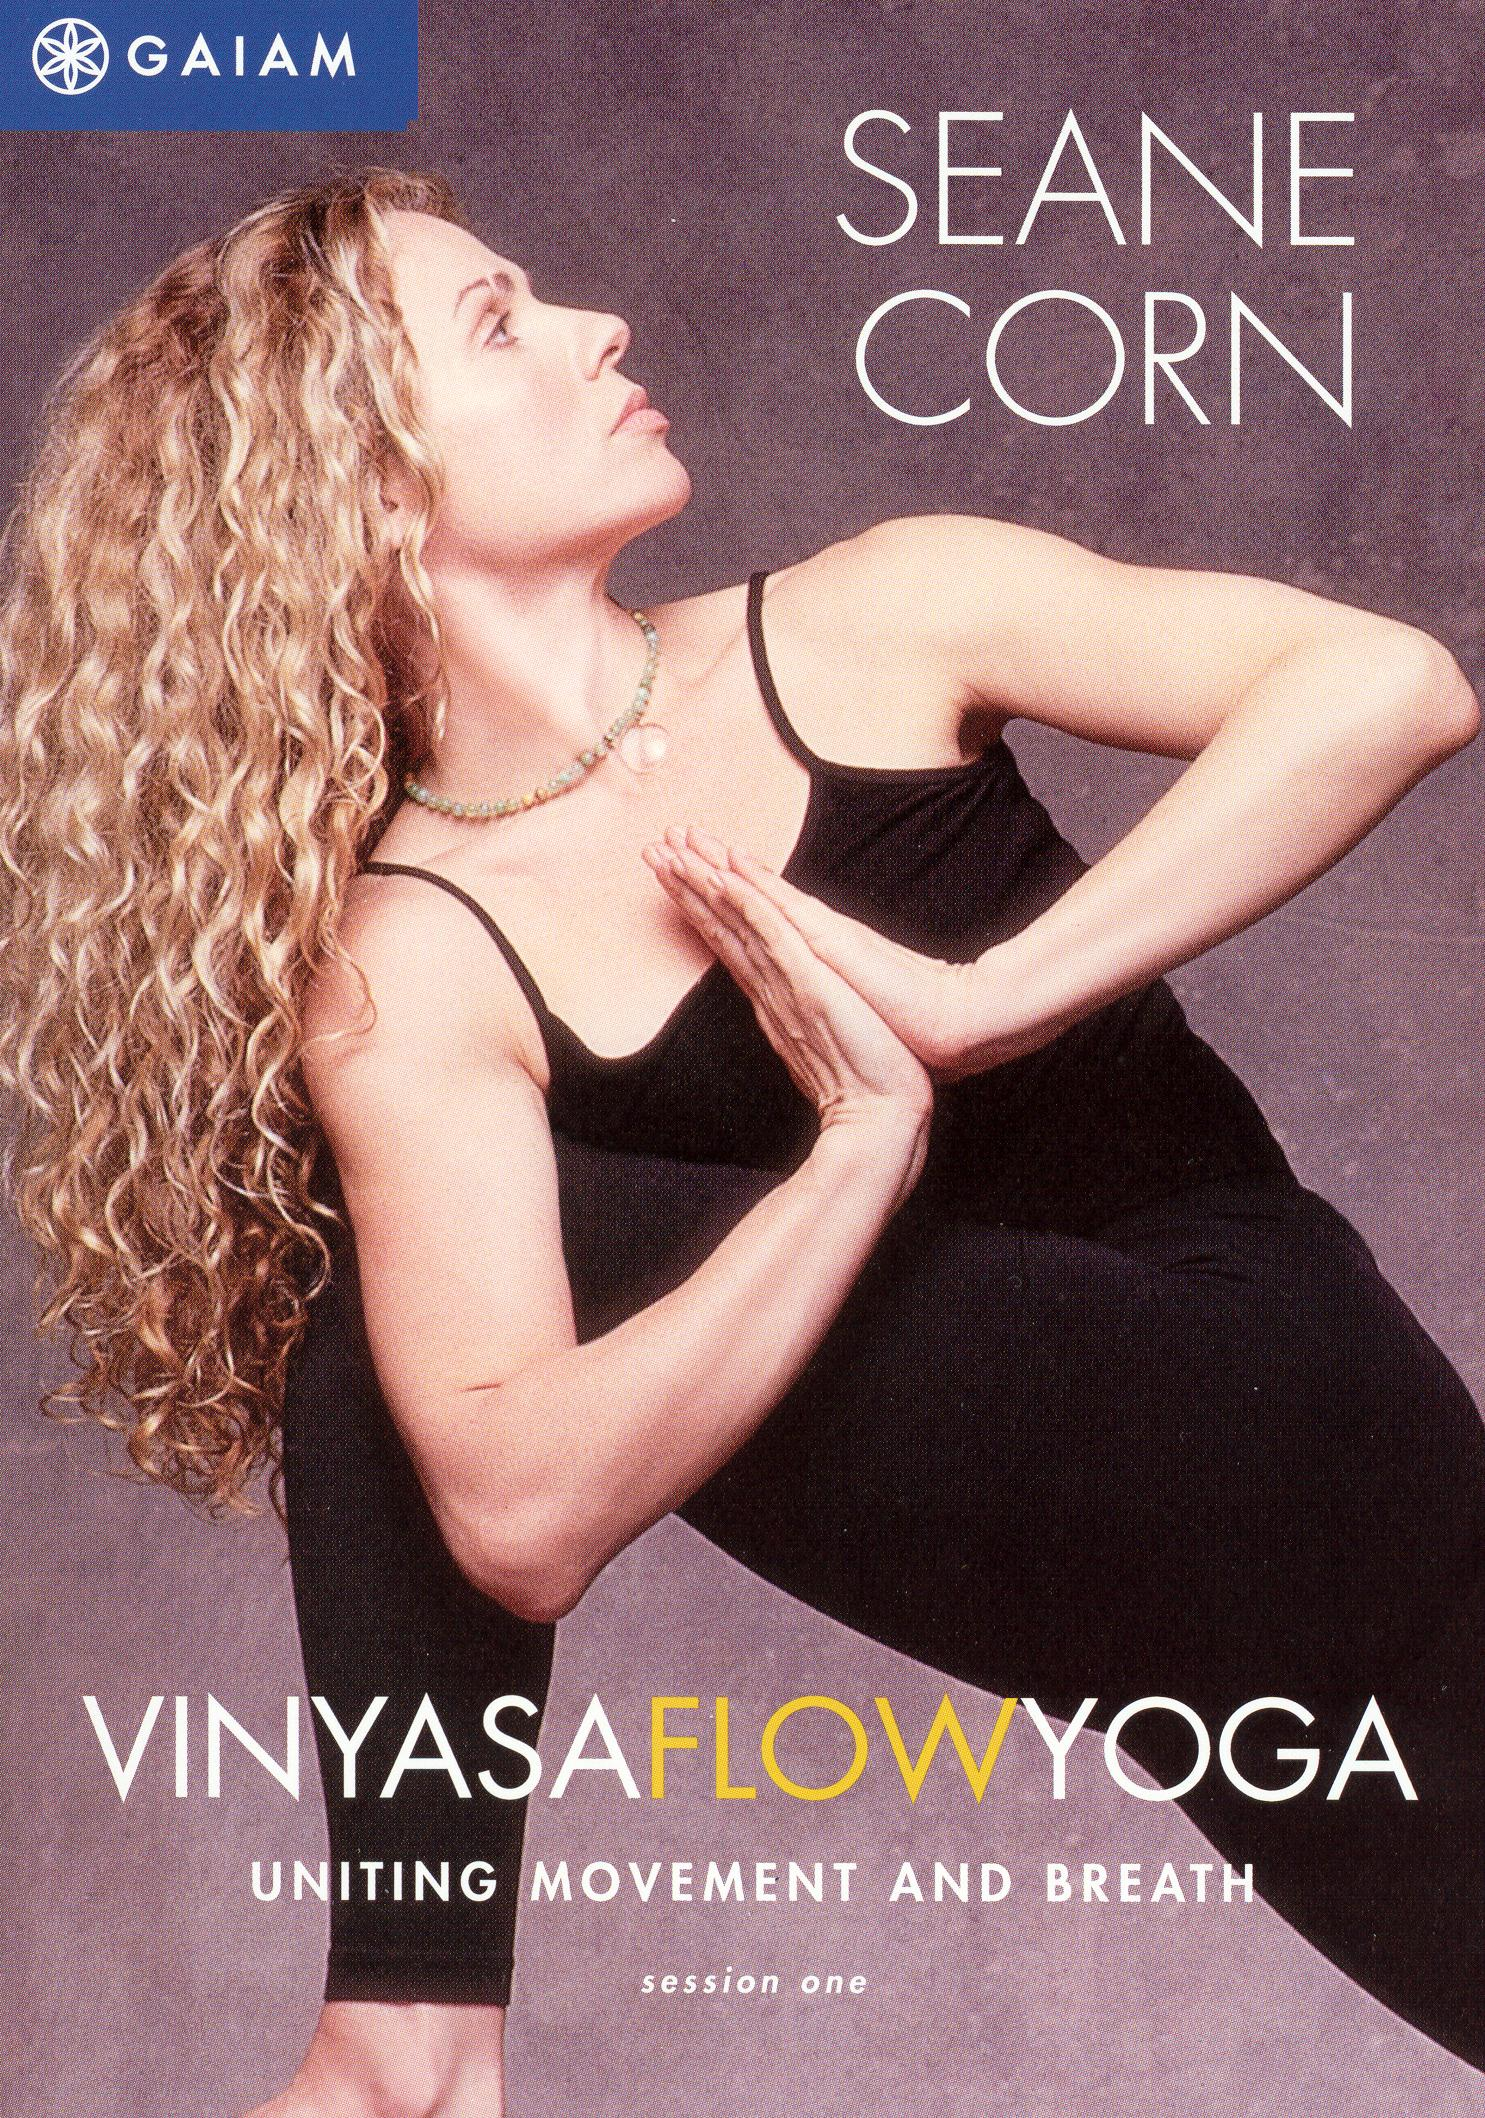 Vinyasa Flow Yoga: Uniting Movement and Breath - Session 1